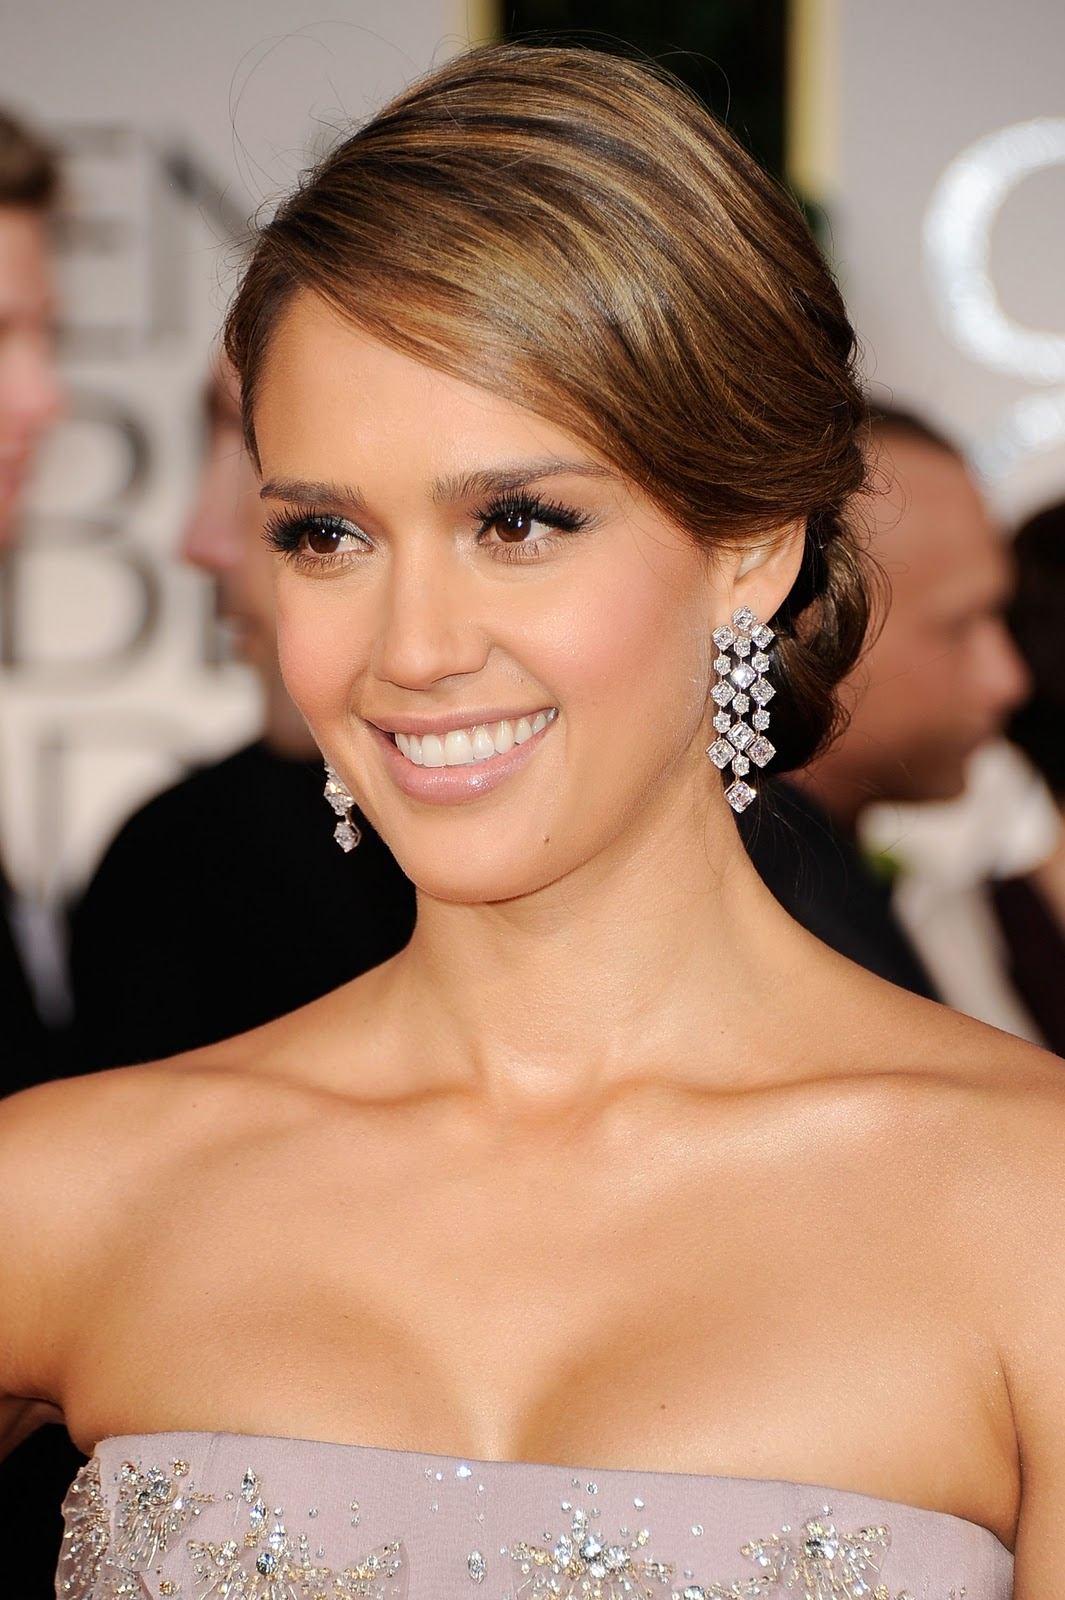 http://1.bp.blogspot.com/-yTMpILUwfuI/TxSMvd5CtqI/AAAAAAAAB0A/7xnlNfSqRC8/s1600/Jessica_Alba_009.jpg